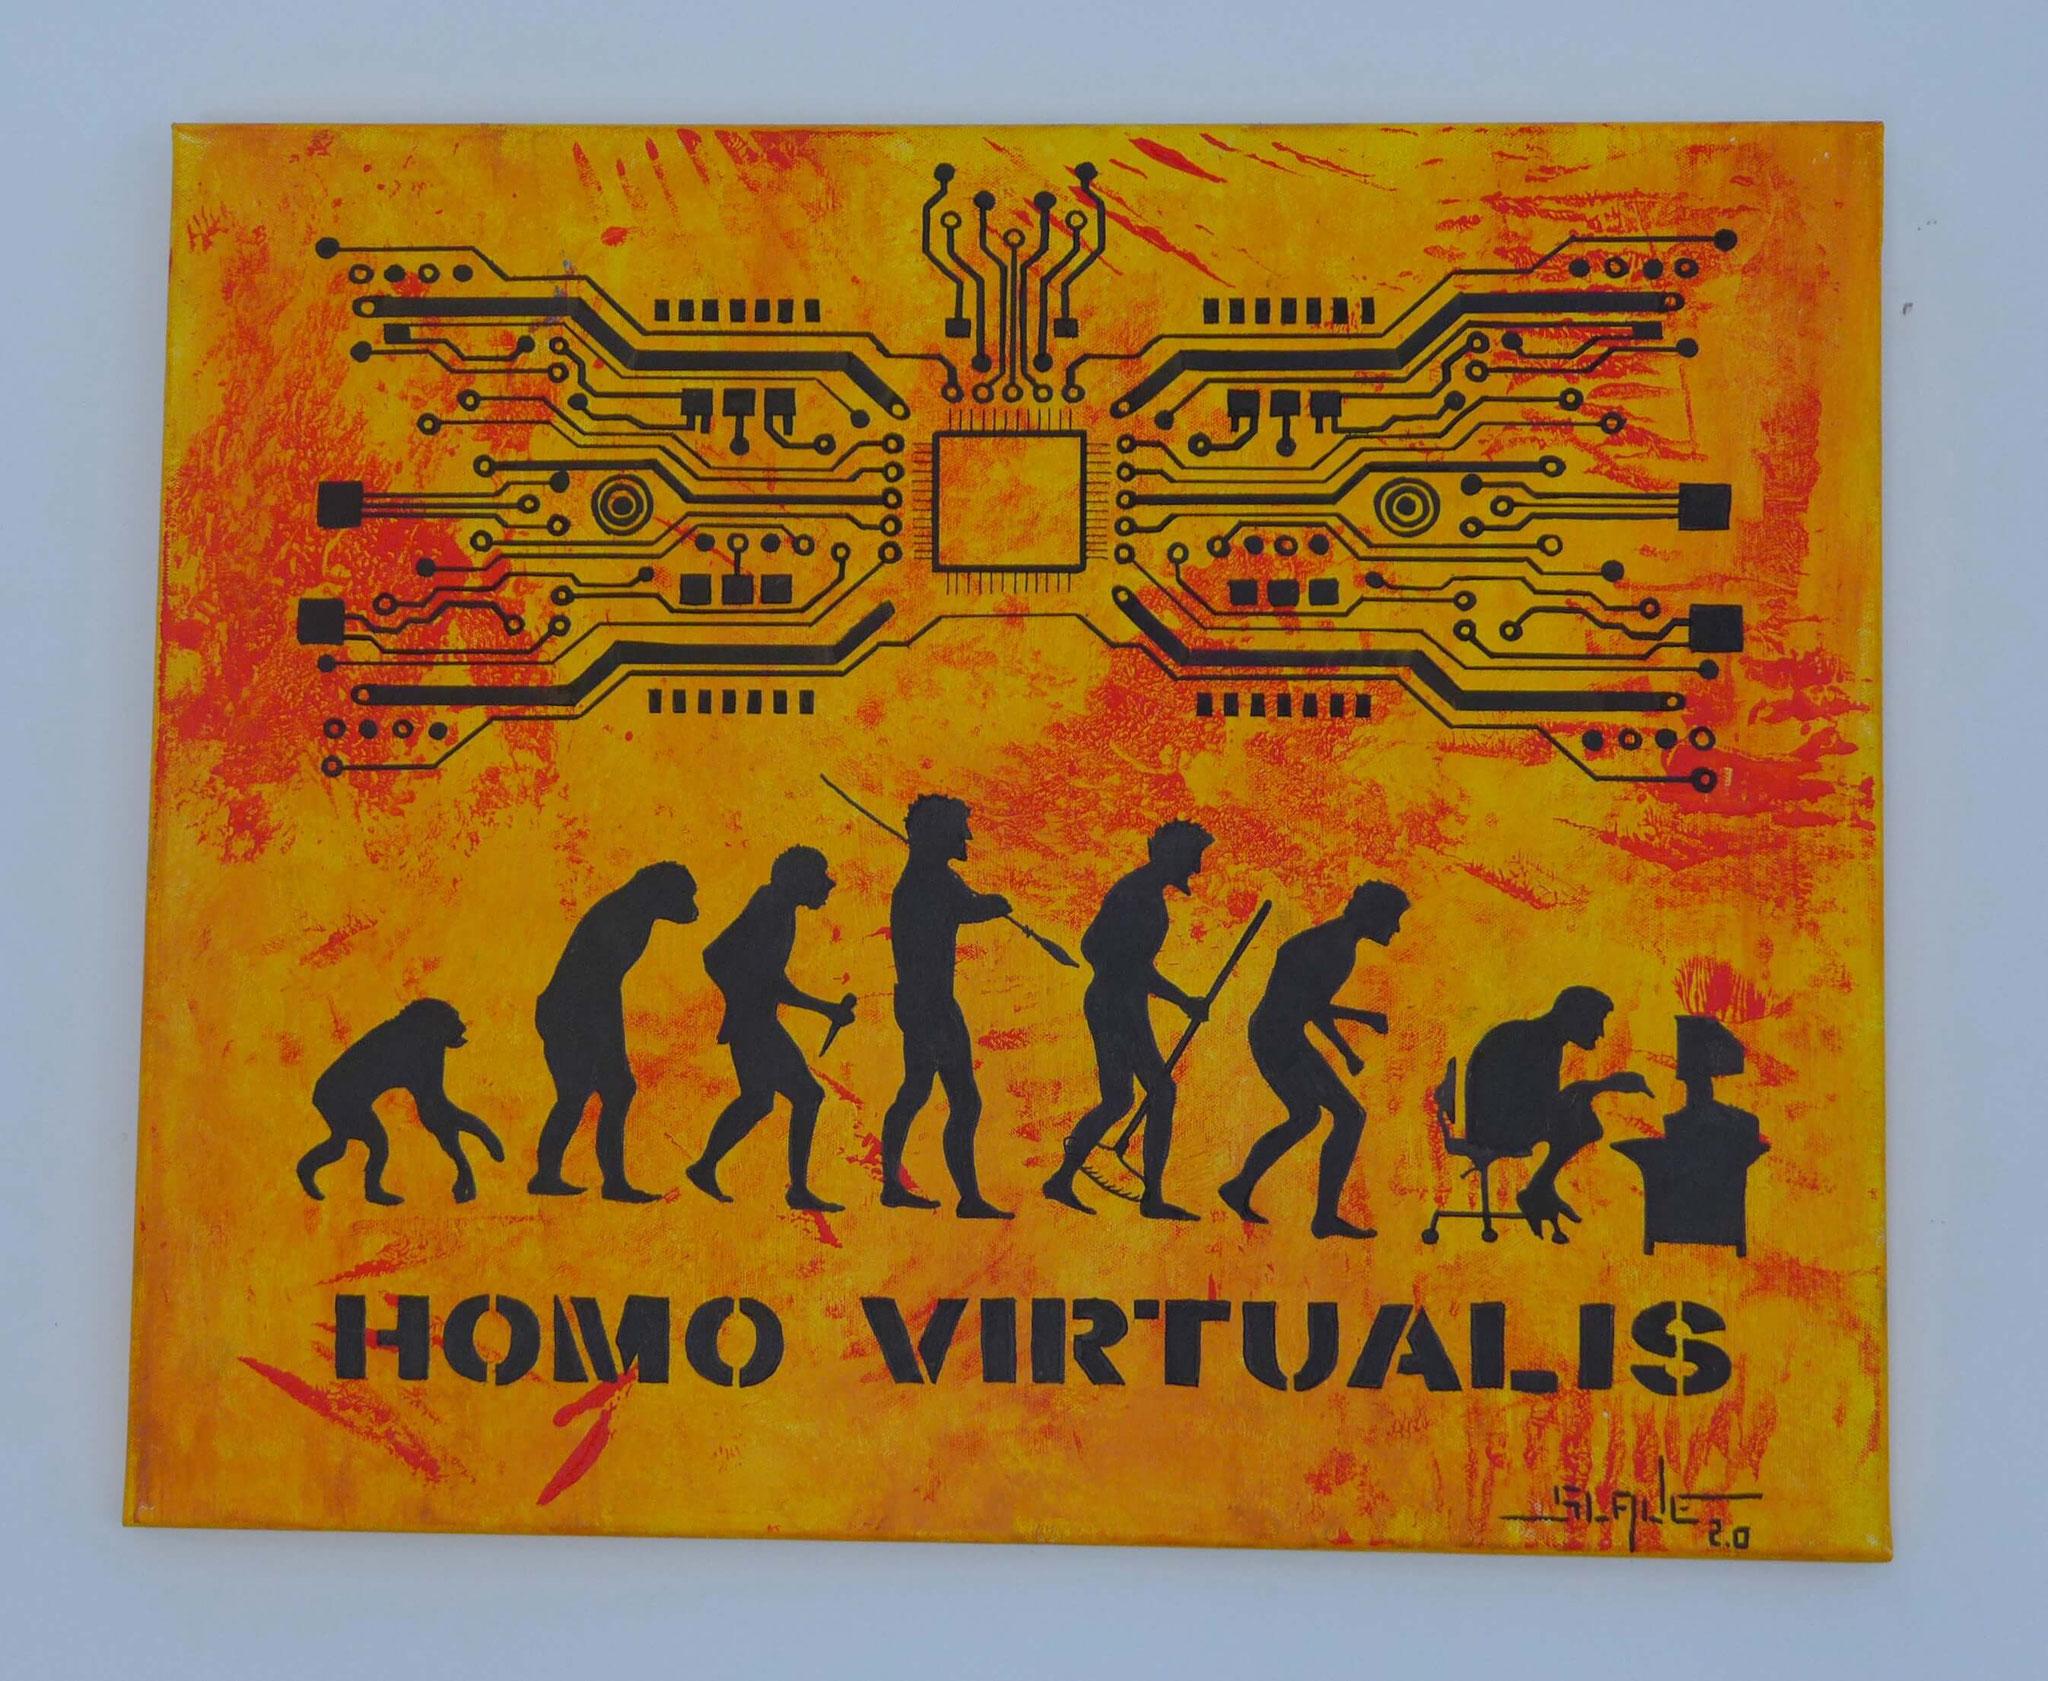 homo-virtualis-street-art-sur-toile-tableau-slave-2.0